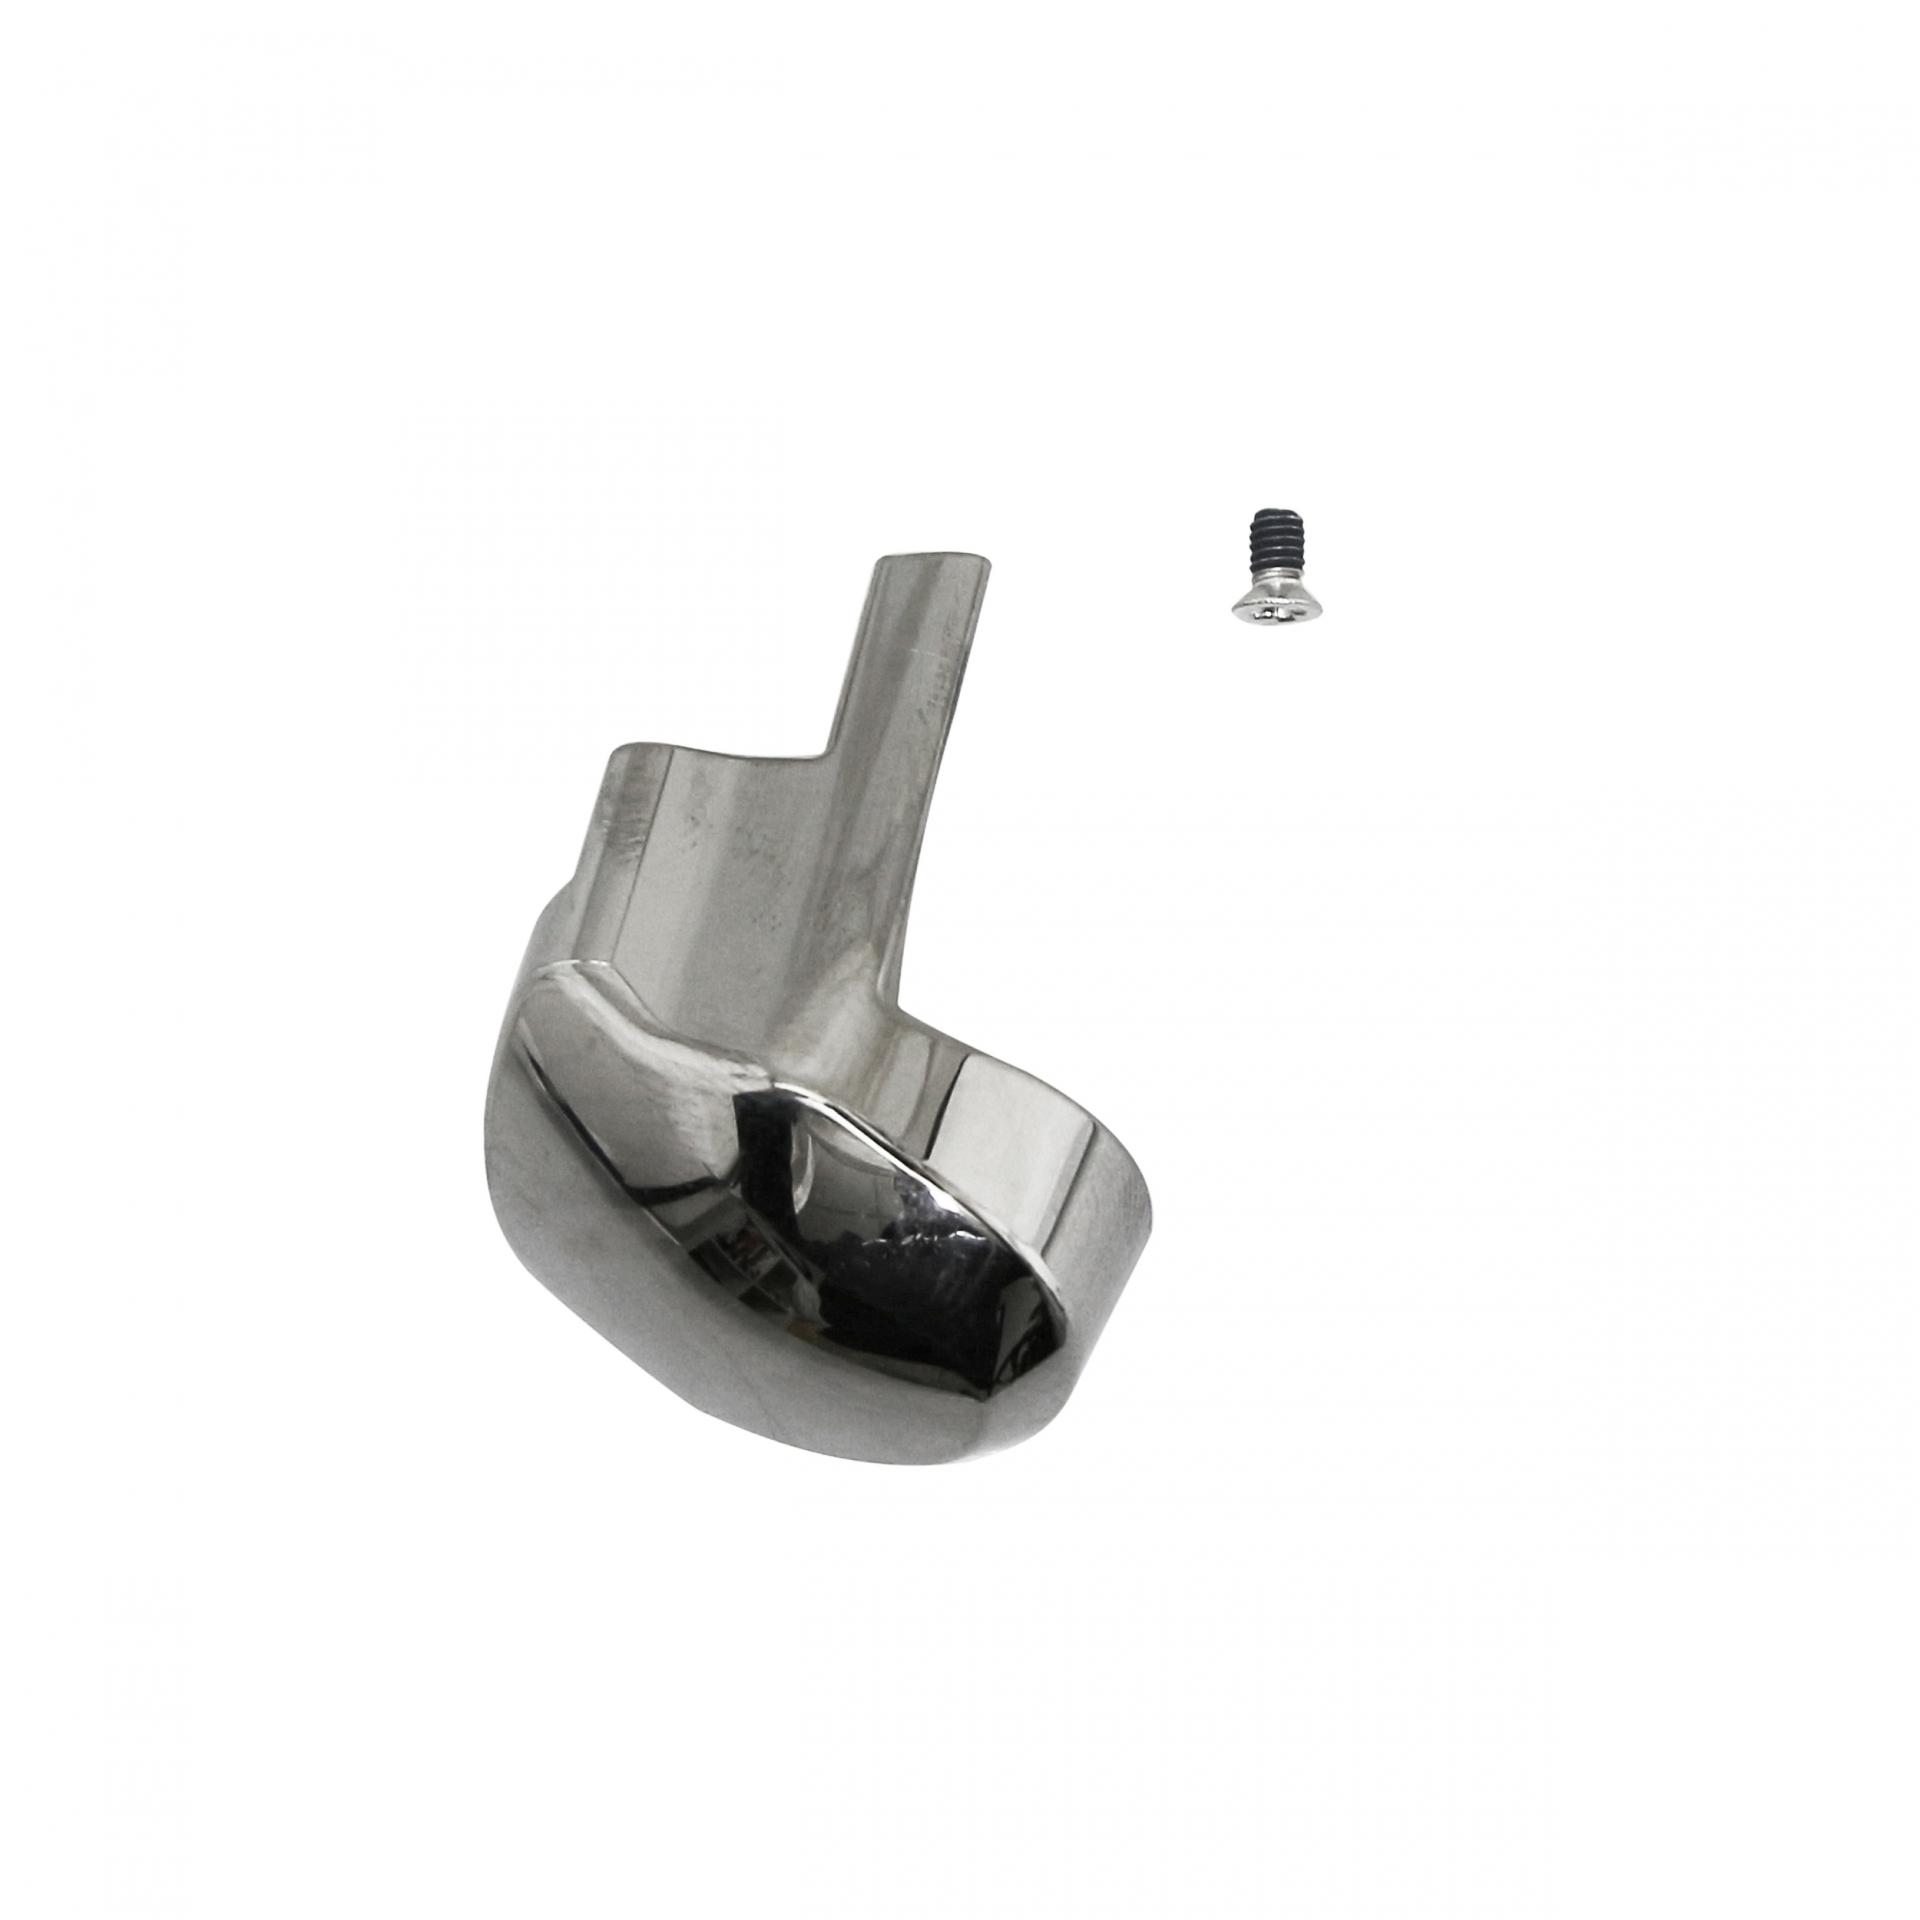 Capot frontal manette Shimano Ultegra R8000 11V Gauche